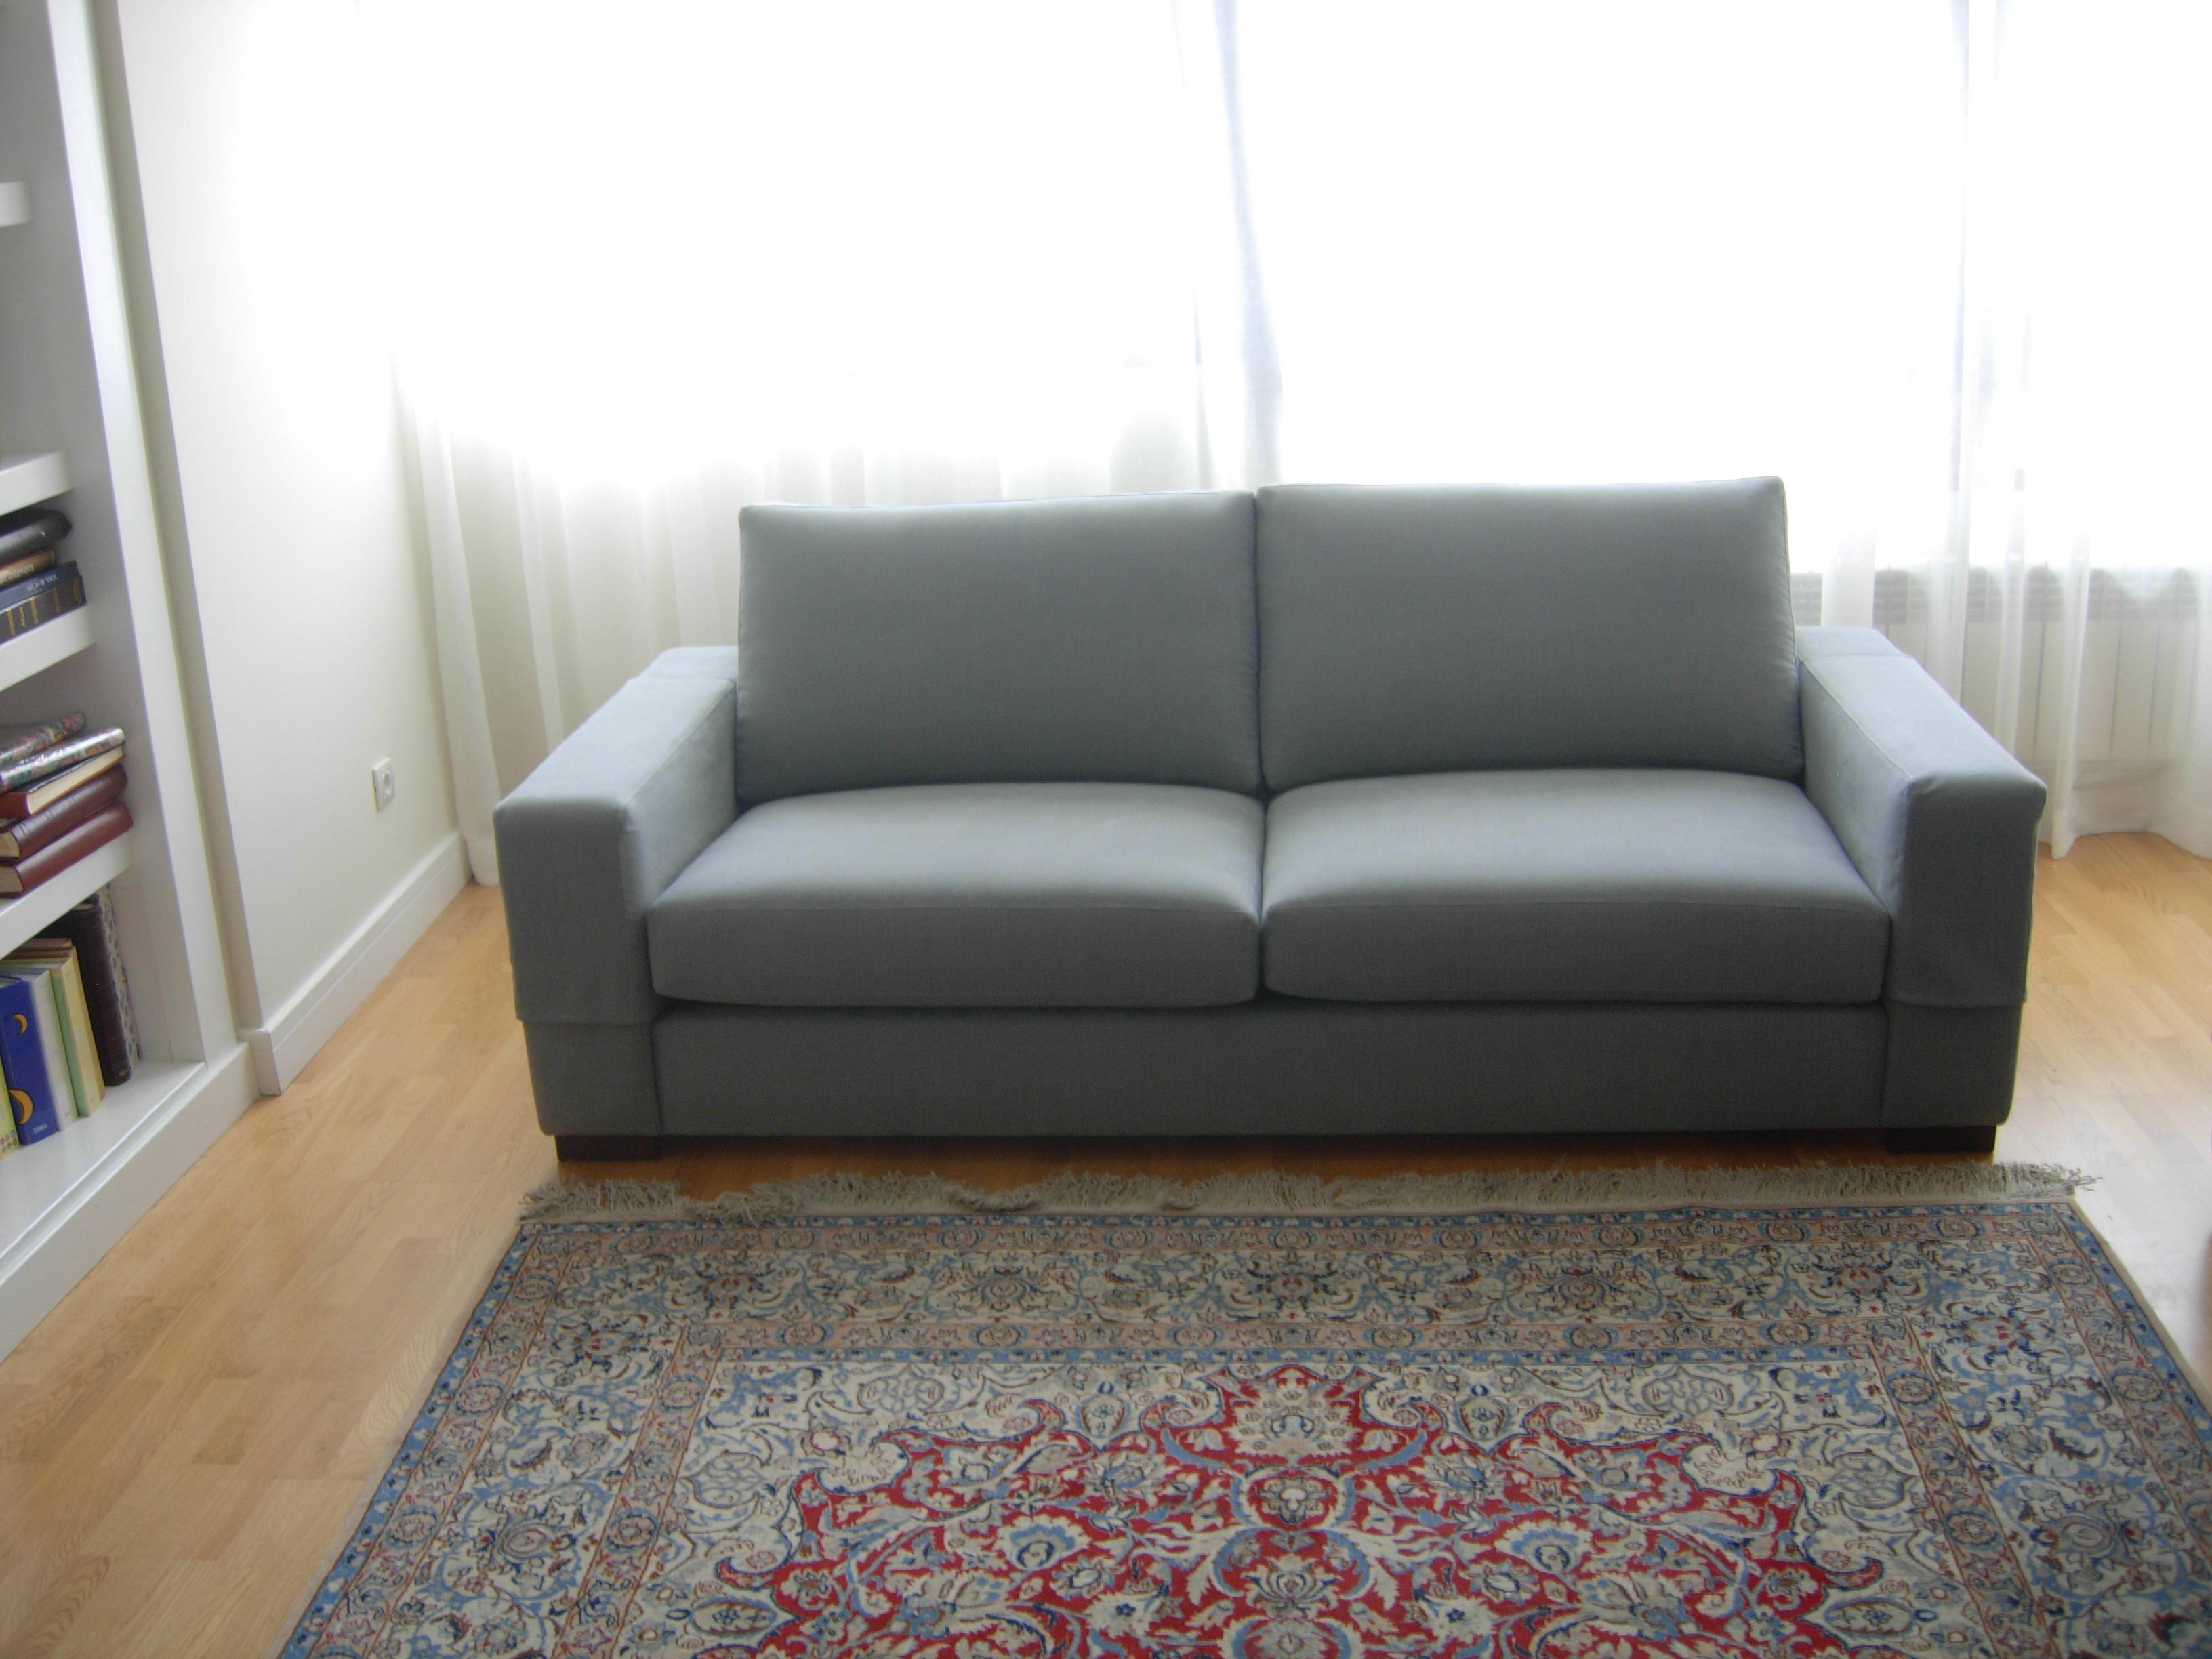 Sofa mirlo 2 pl tapizados artesanos tapizados artesanos - Artesanos del sofa ...